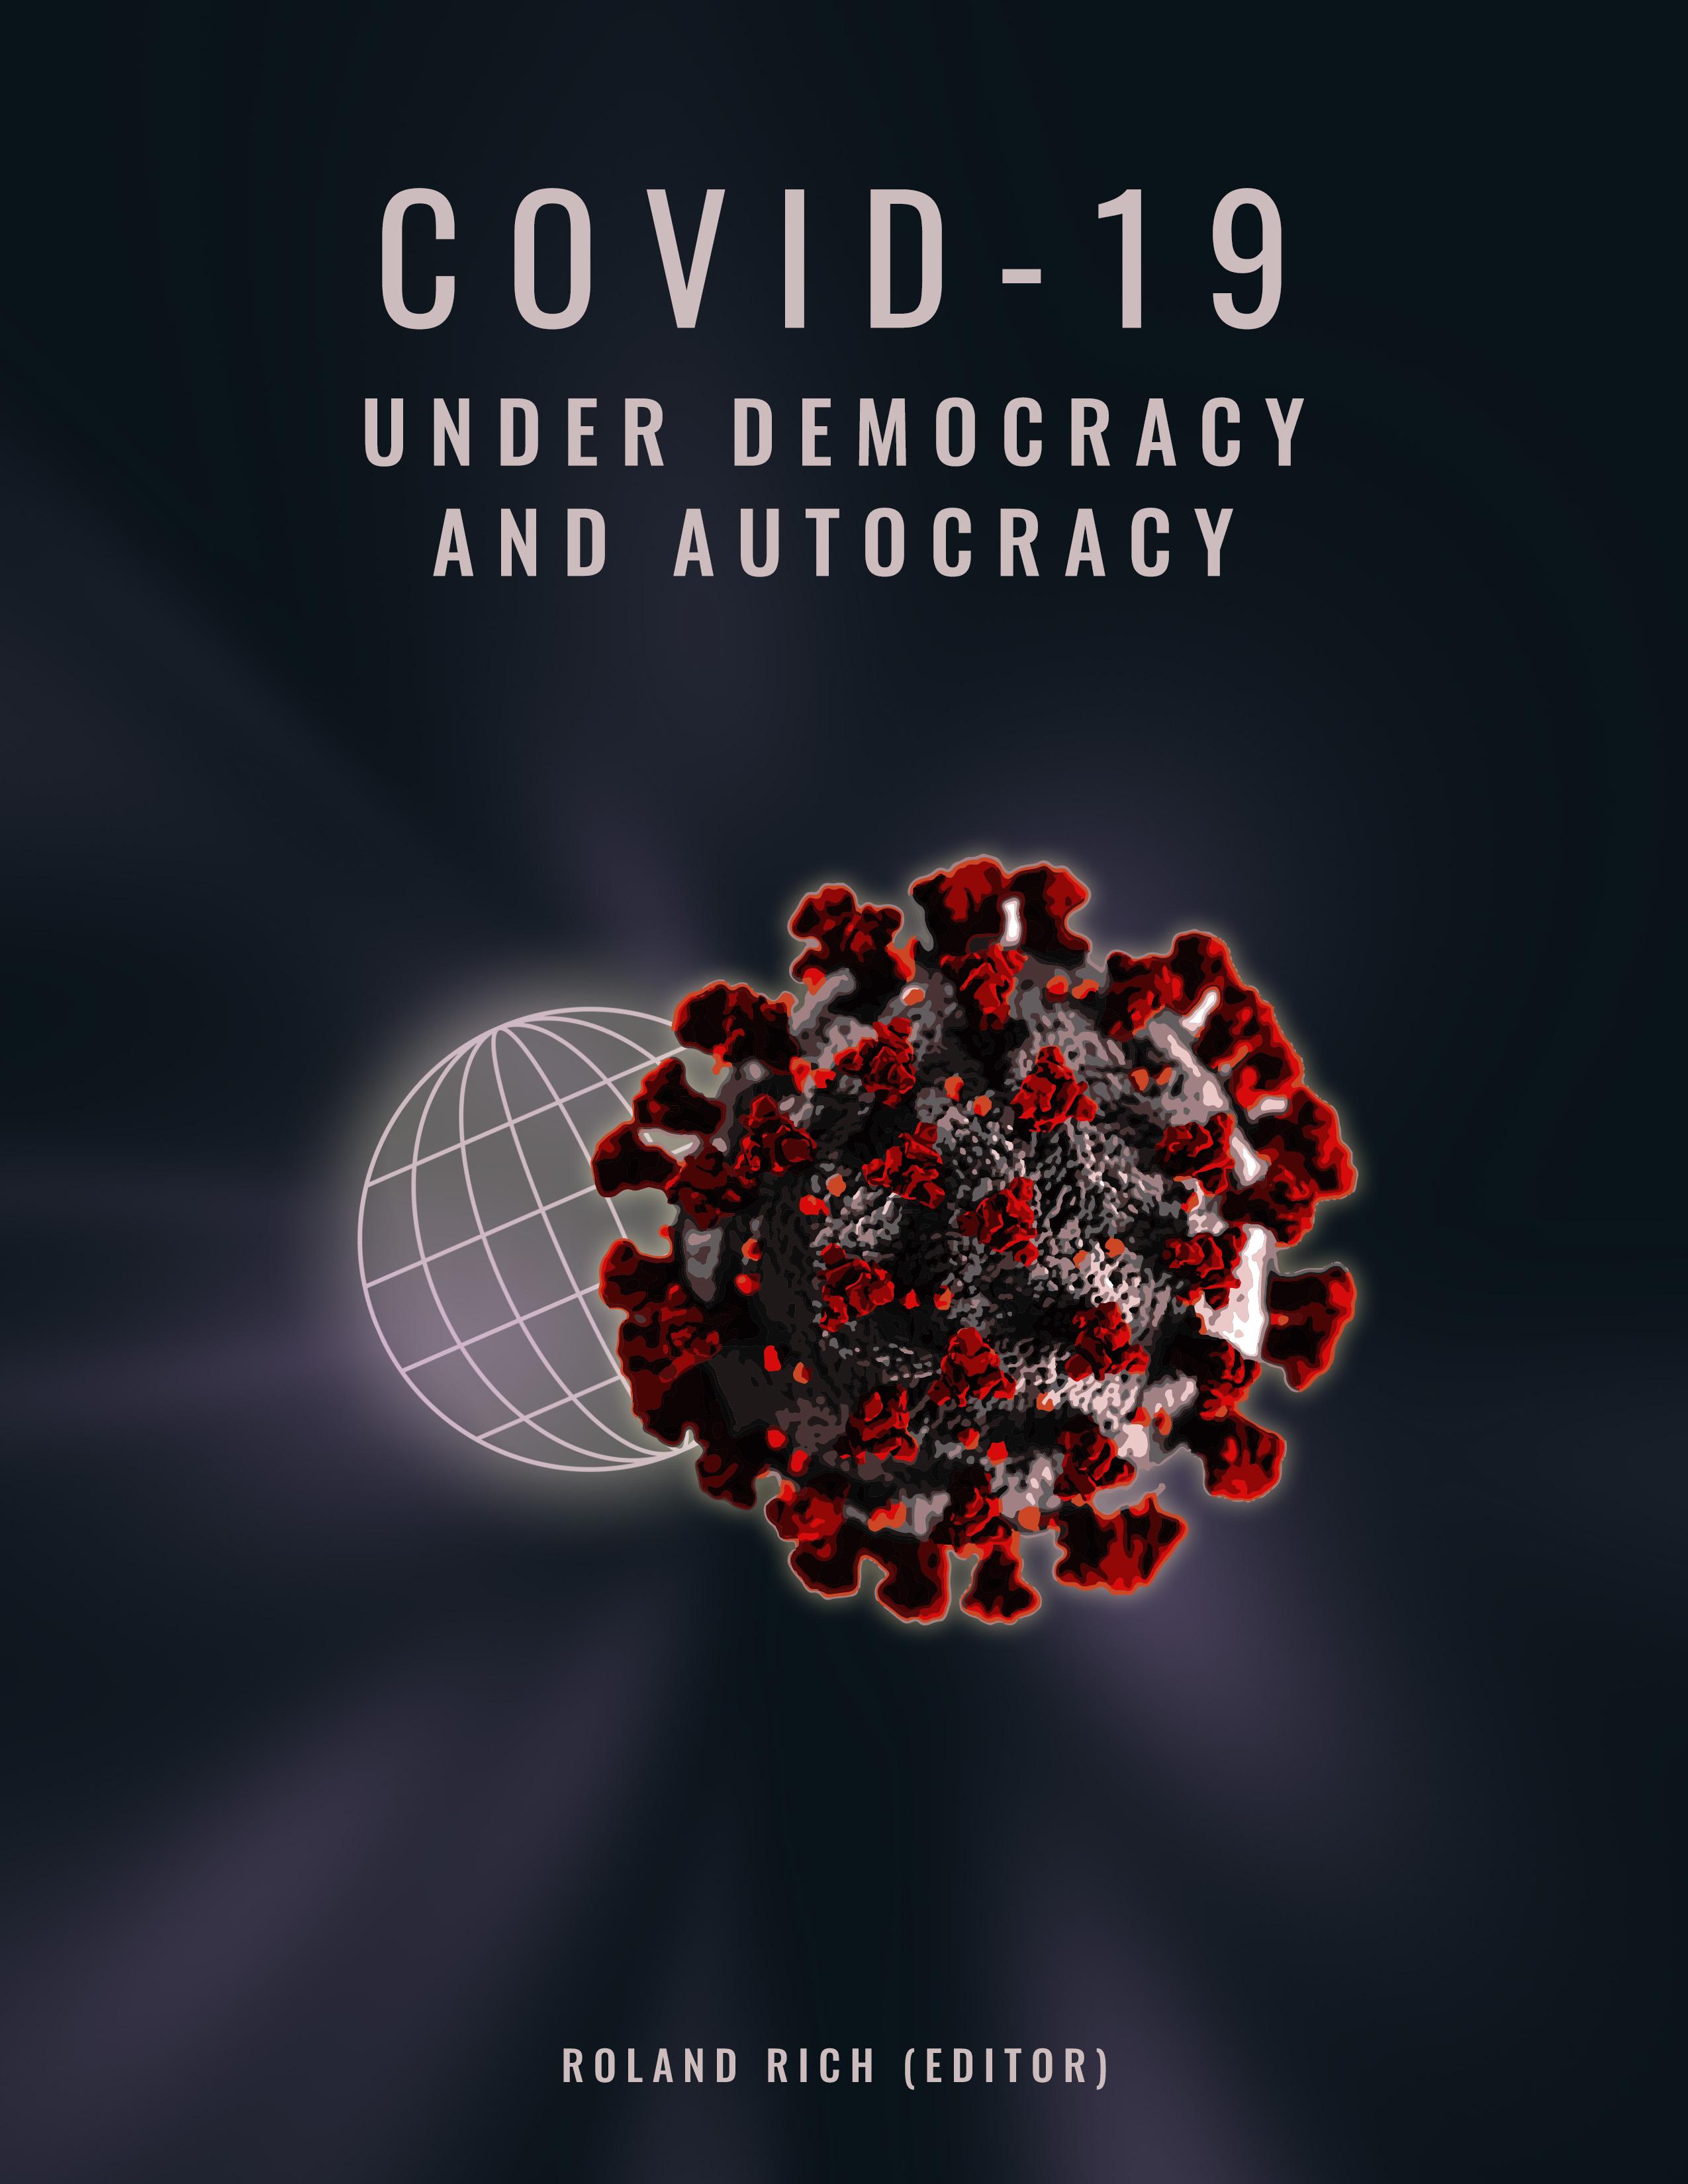 COVID-19 Under Democracy and Autocracy